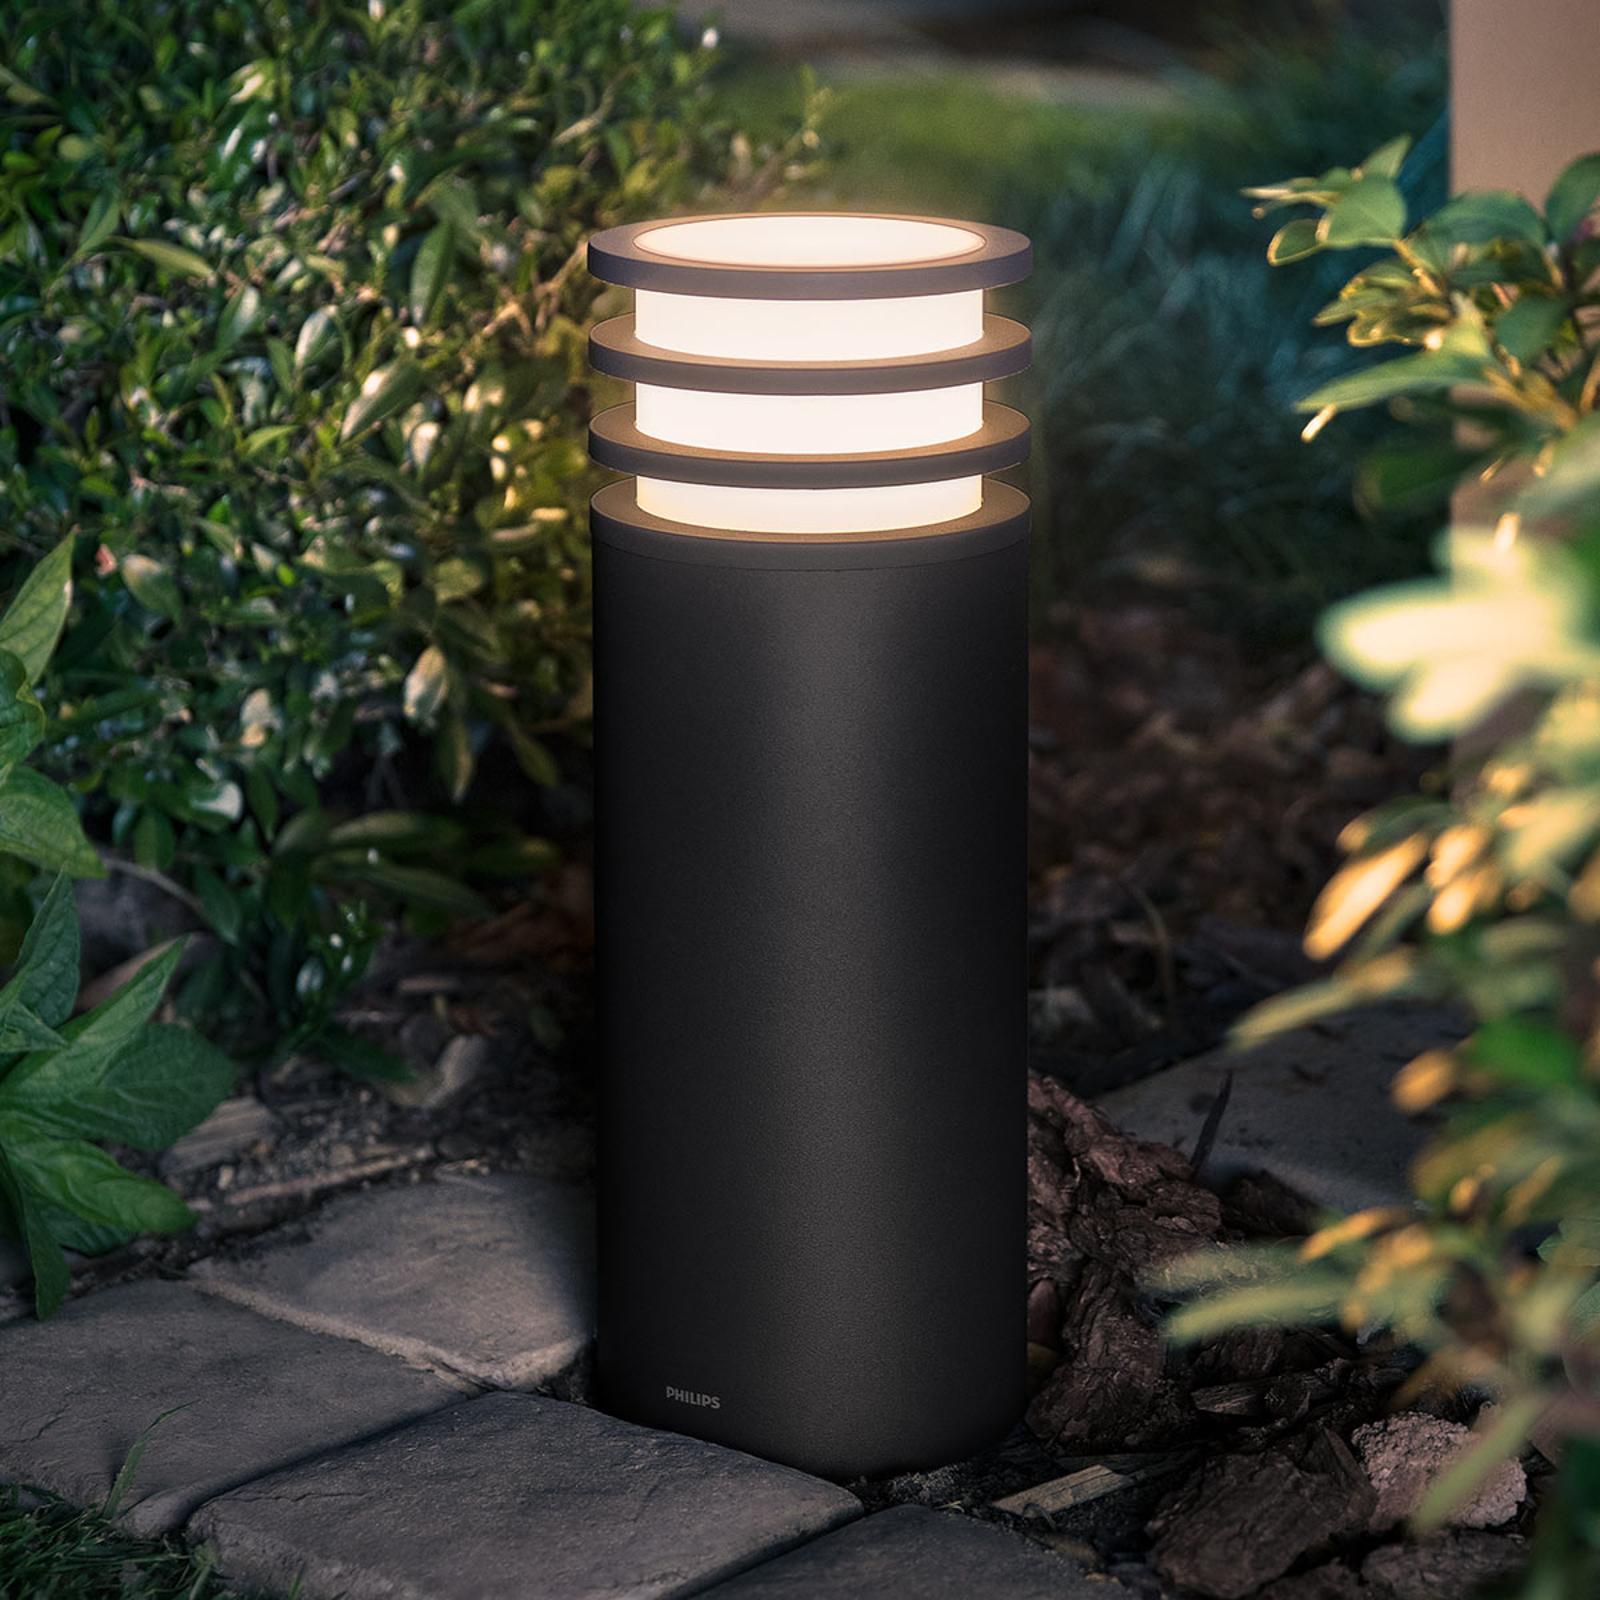 Philips Hue lampa cokołowa LED Lucca, aplikacja